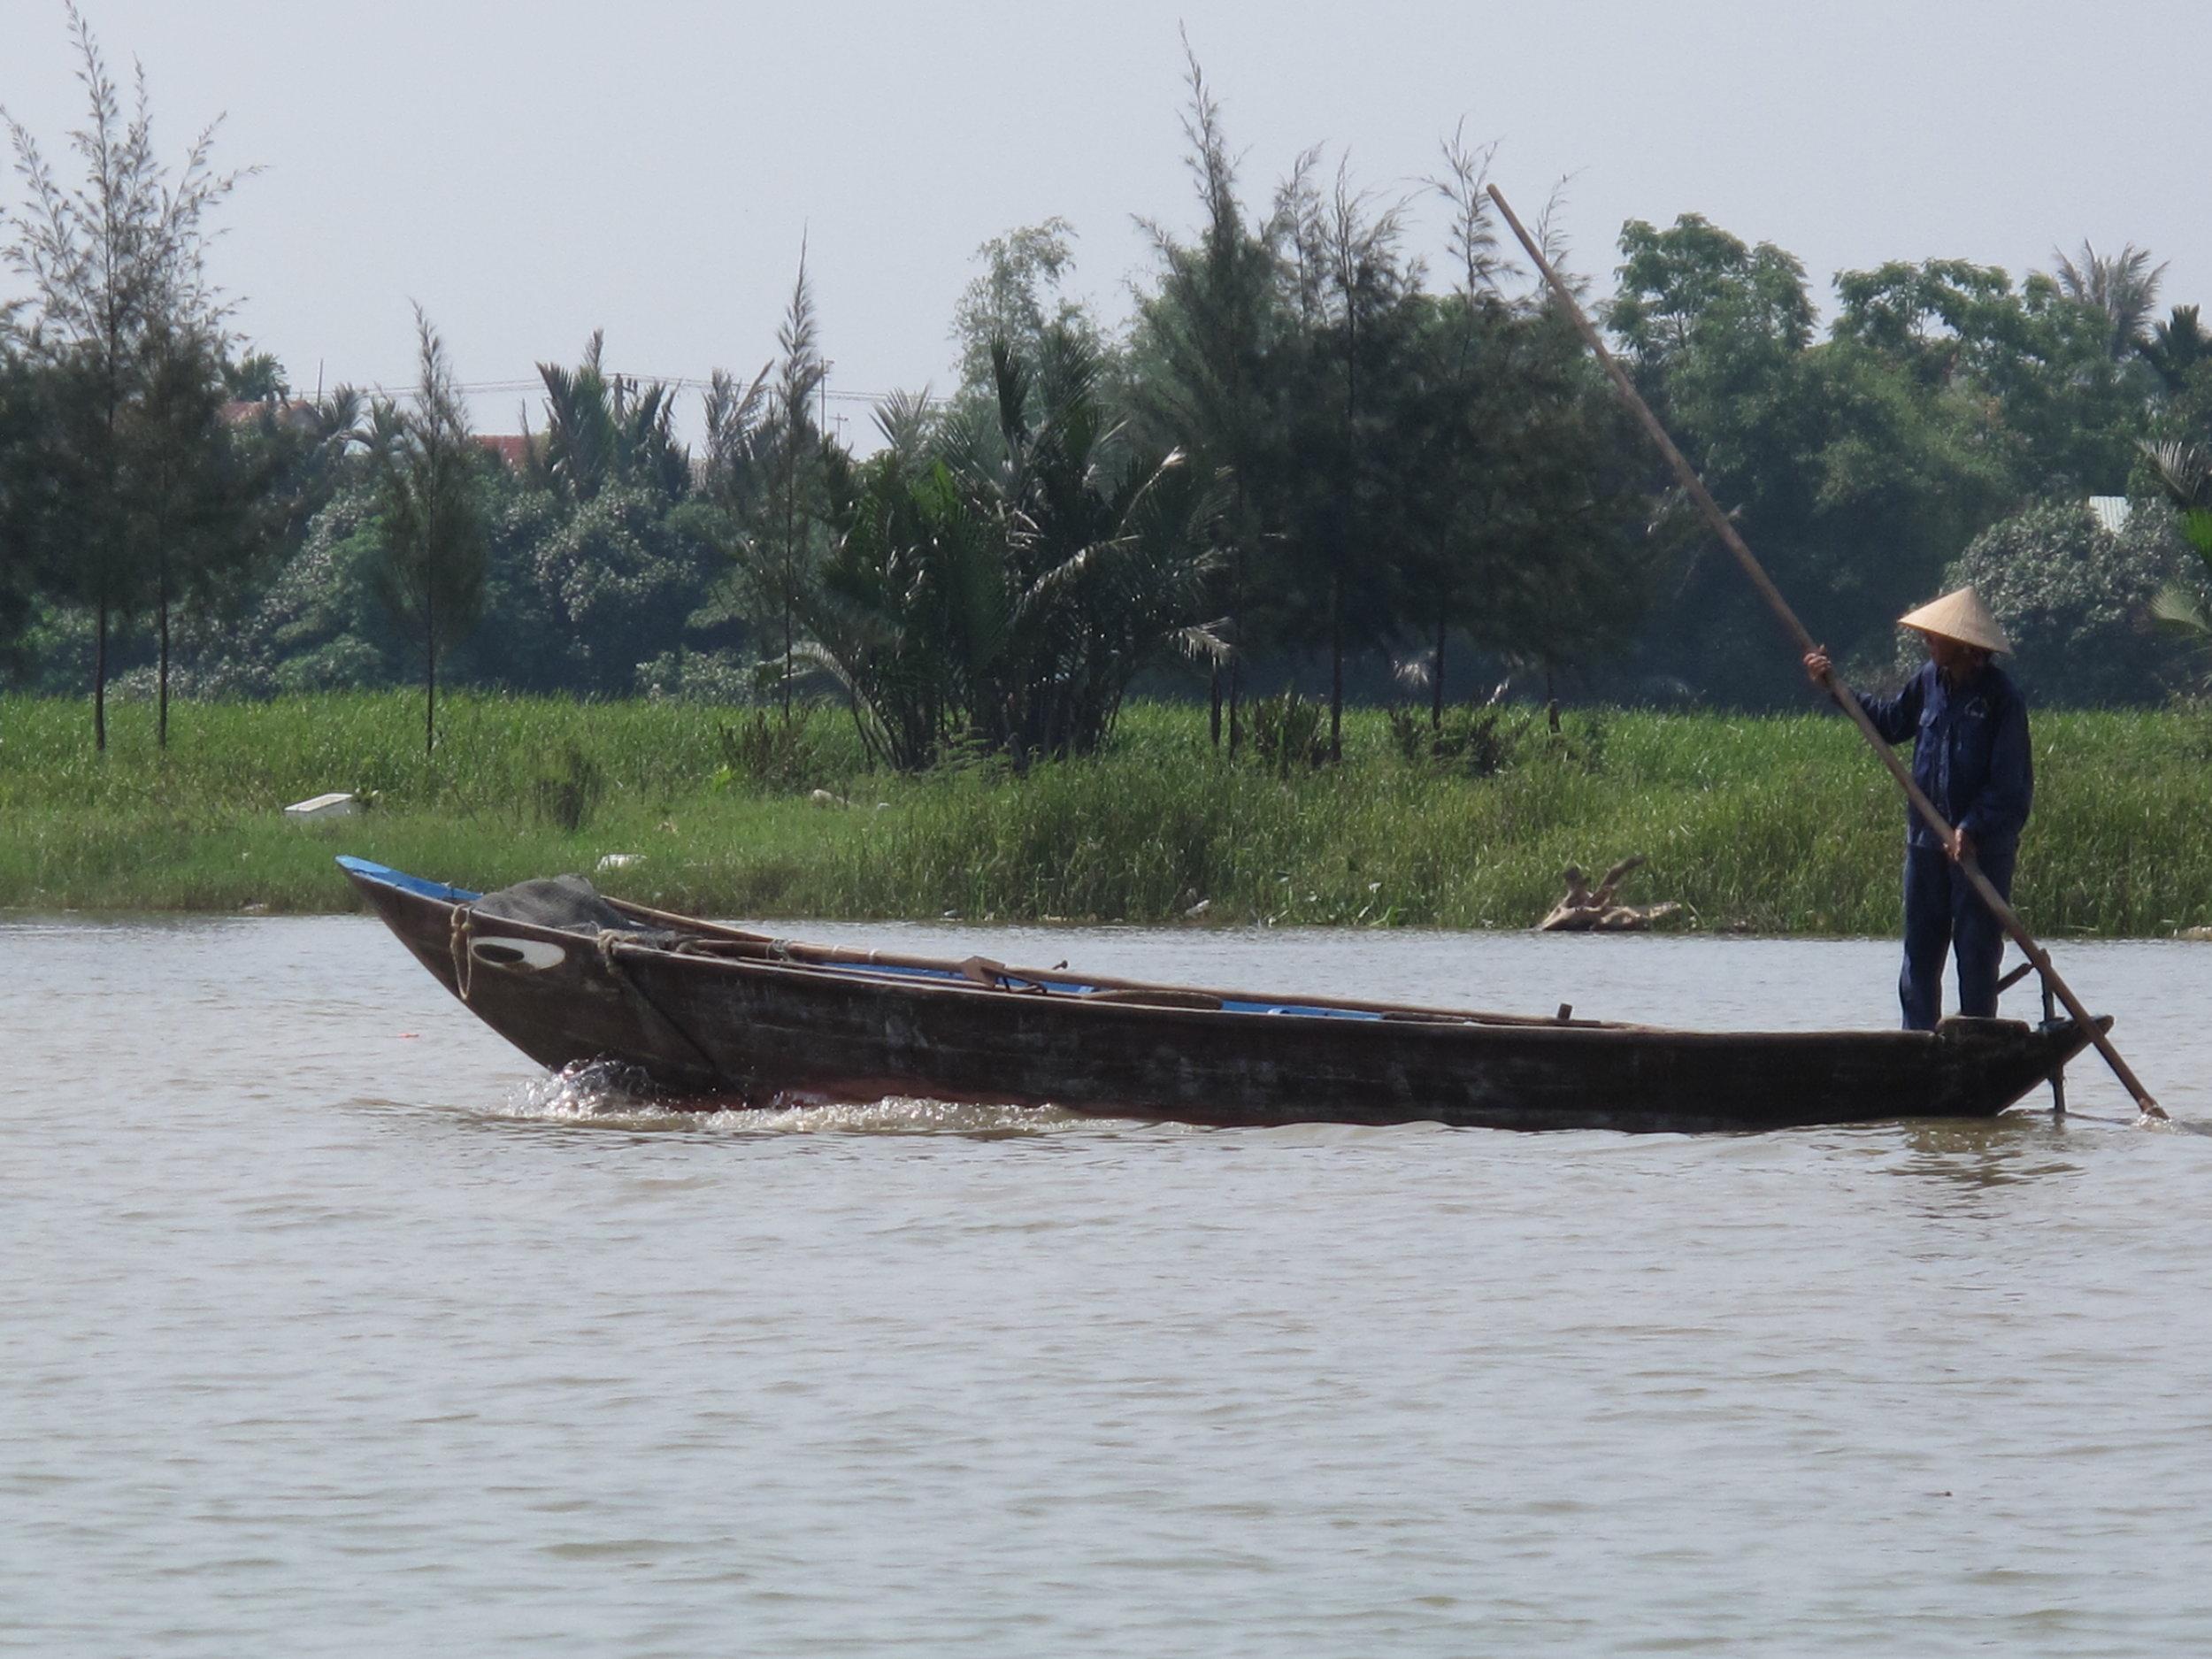 Local fisherman, Hoi An